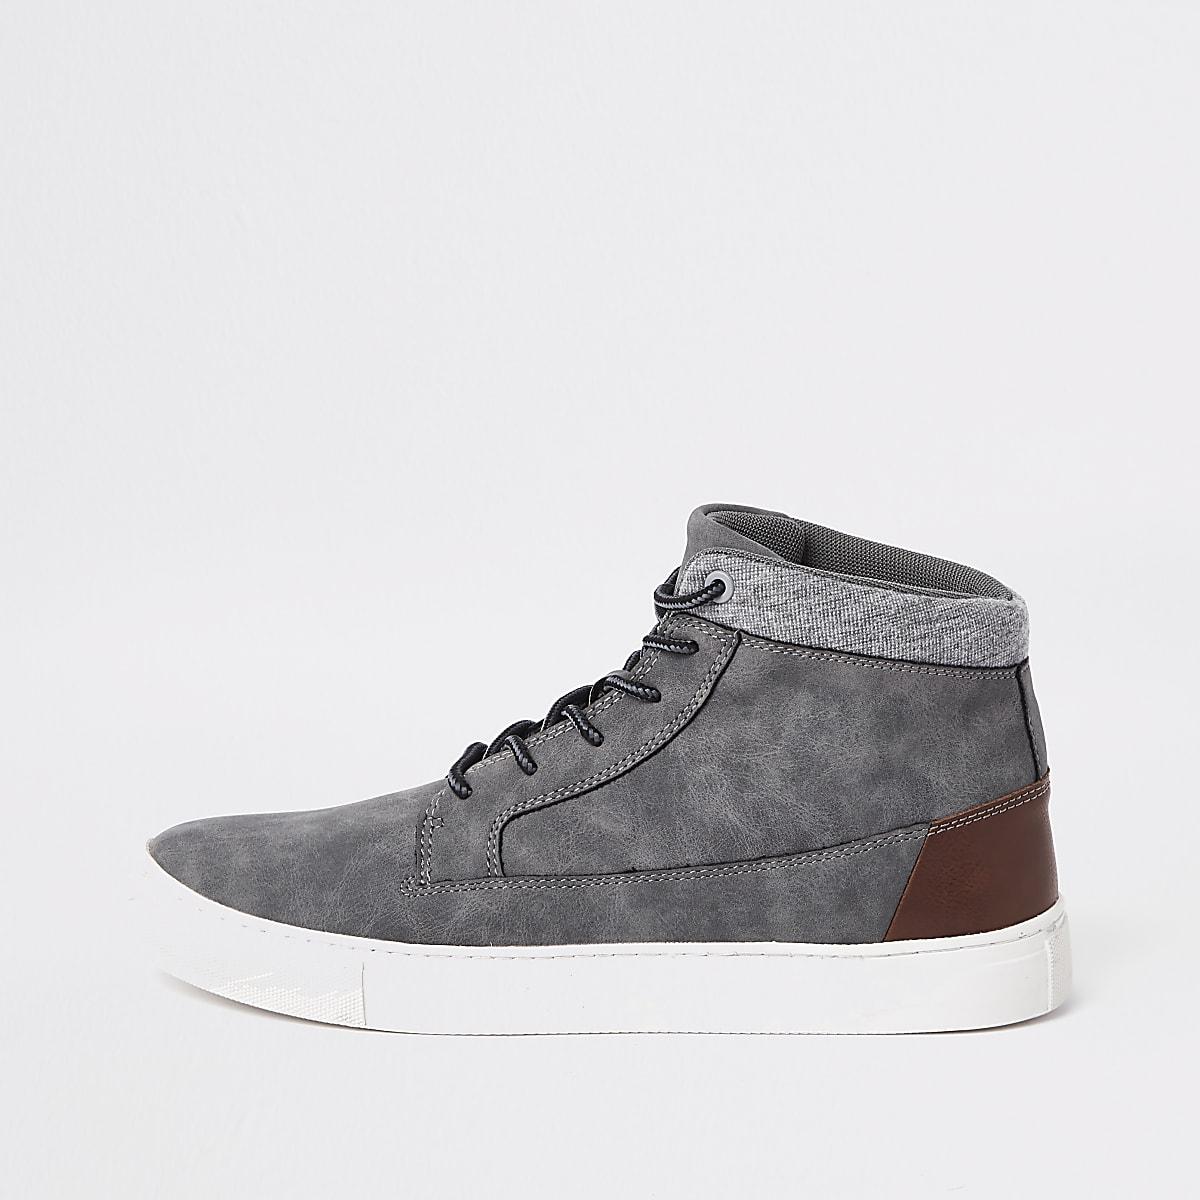 Grey wide fit high top sneakers